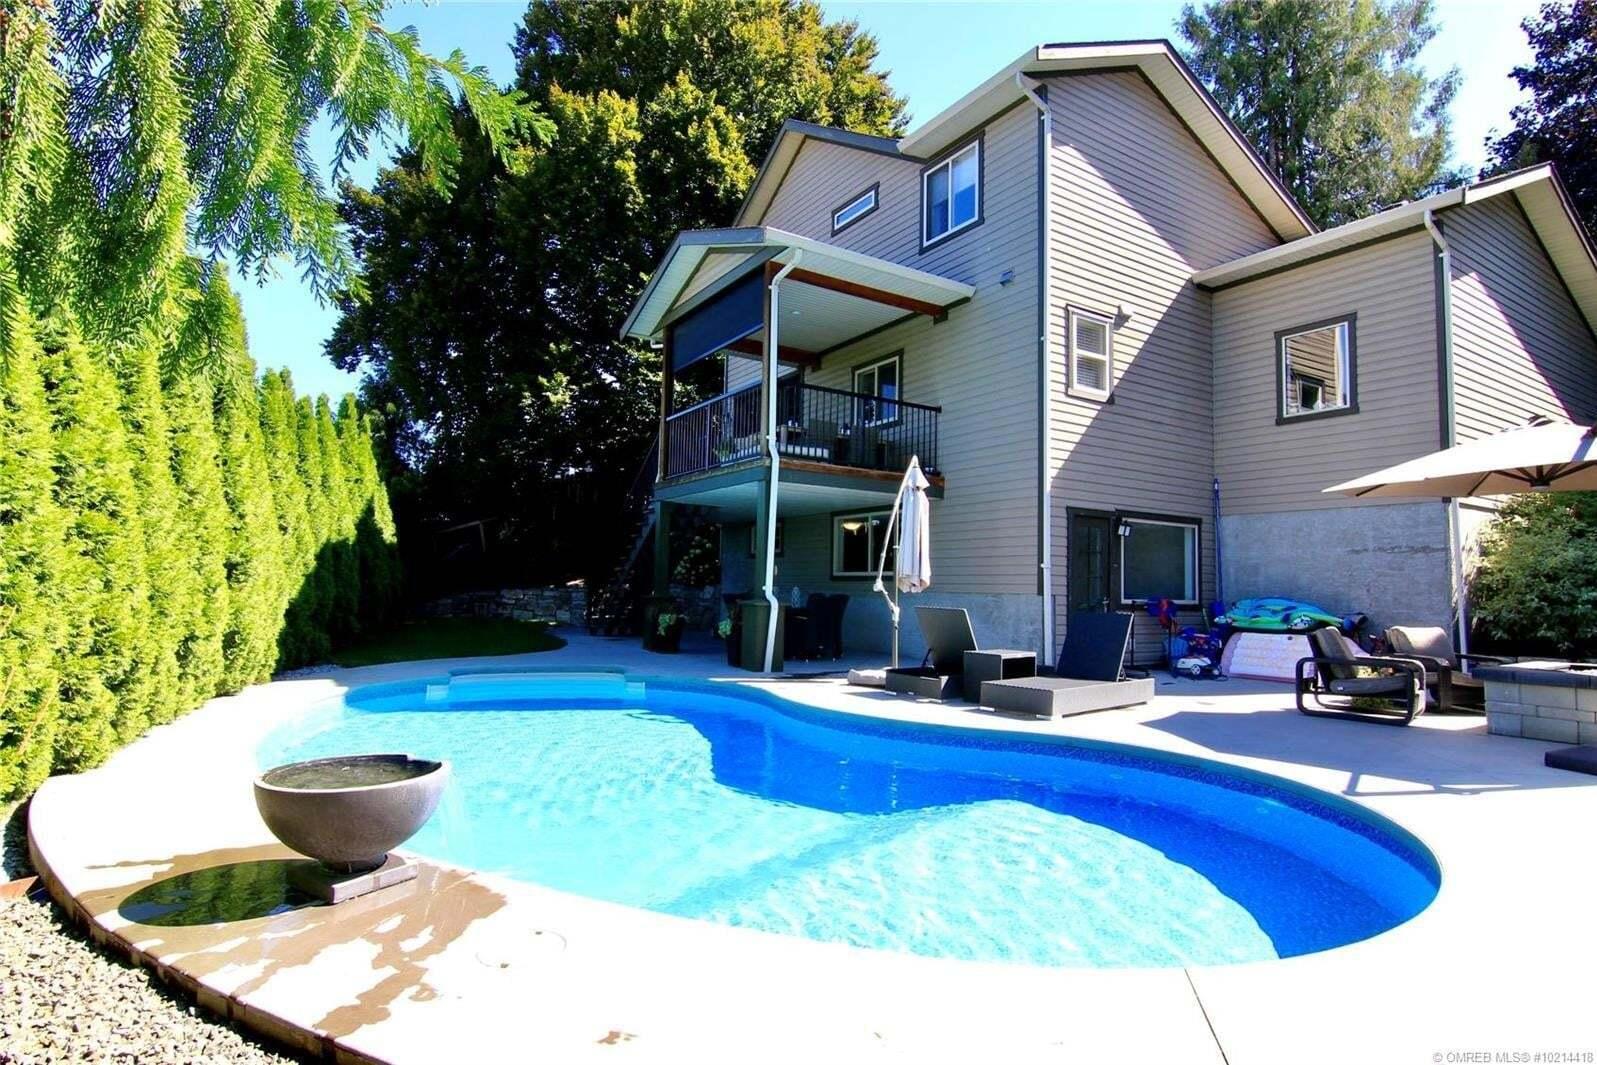 House for sale at 1407 Bankhead Cres Kelowna British Columbia - MLS: 10214418